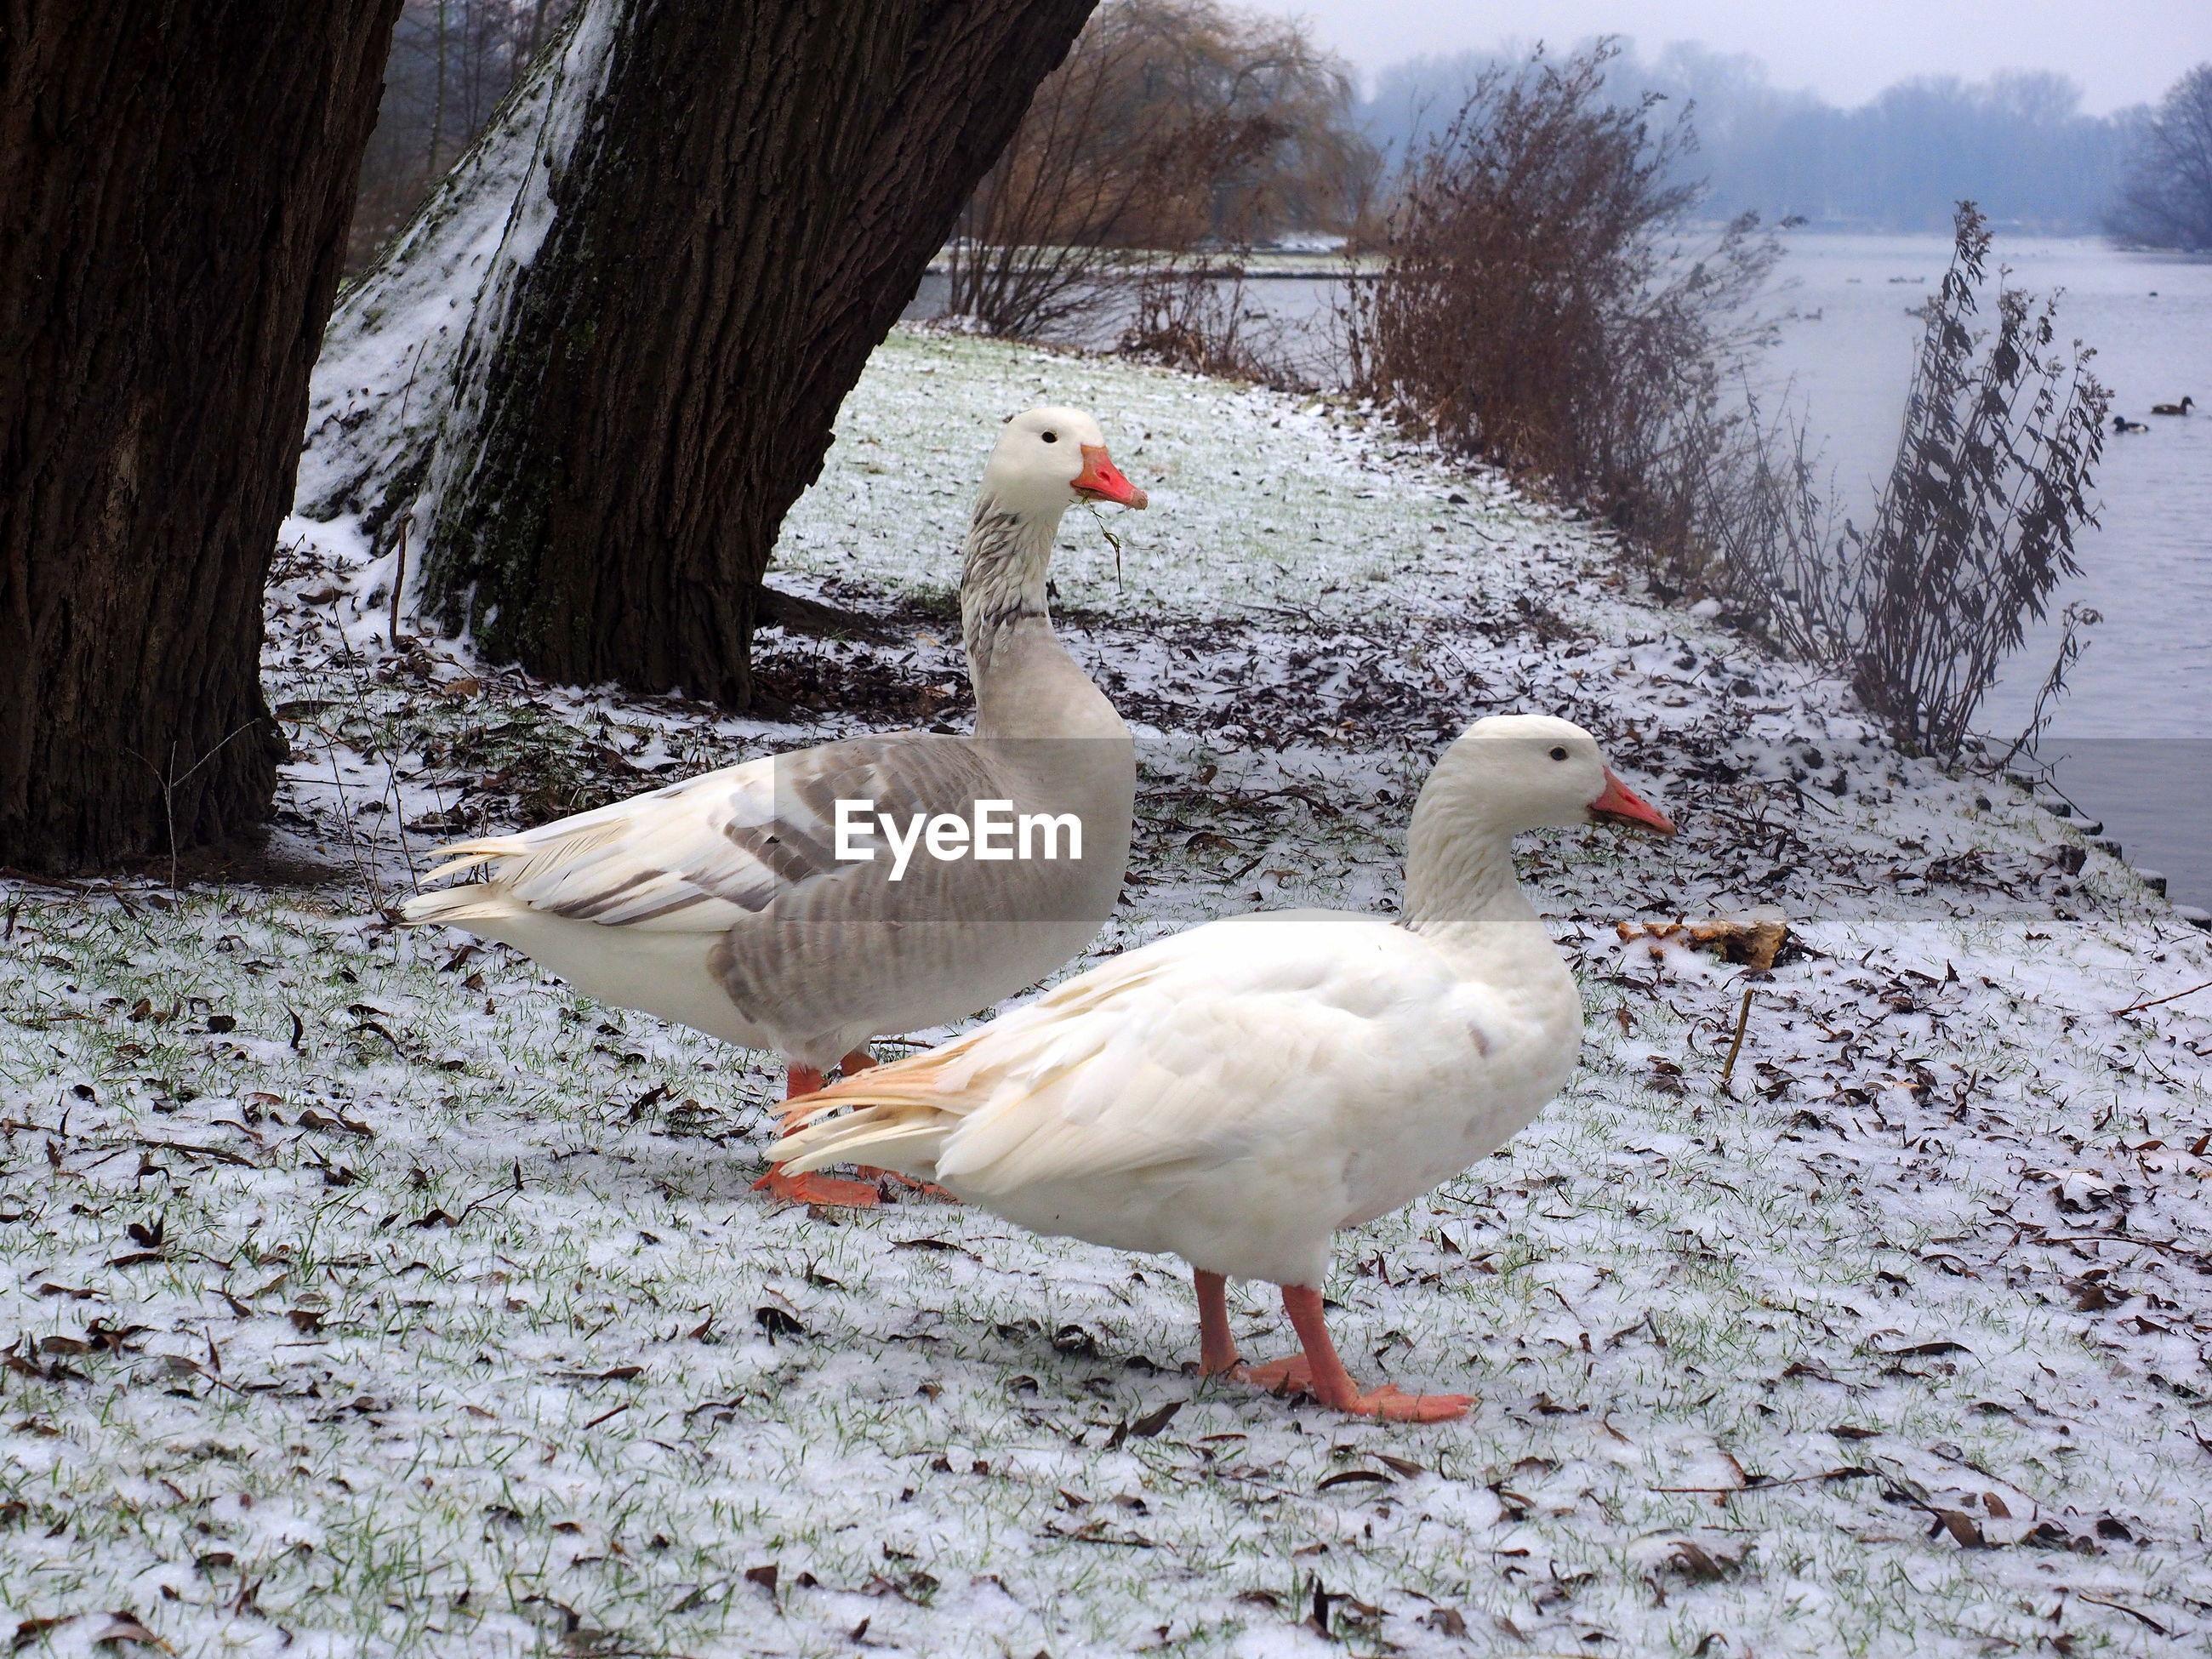 Ducks on lakeshore